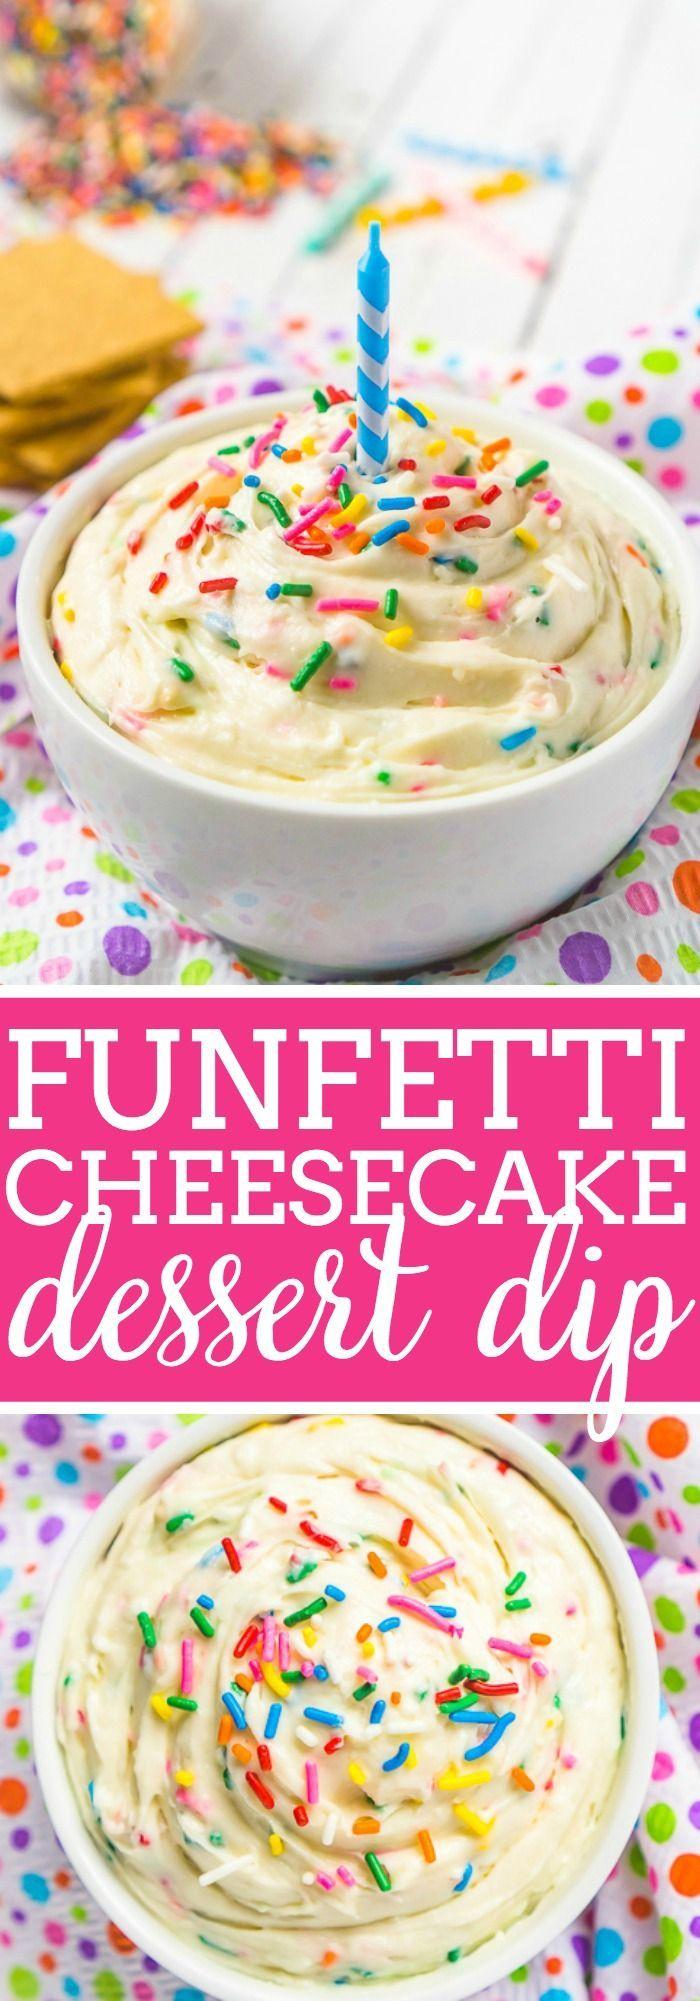 Funfetti Cheesecake Dip Recipe Cake batter dip Cheesecake dip